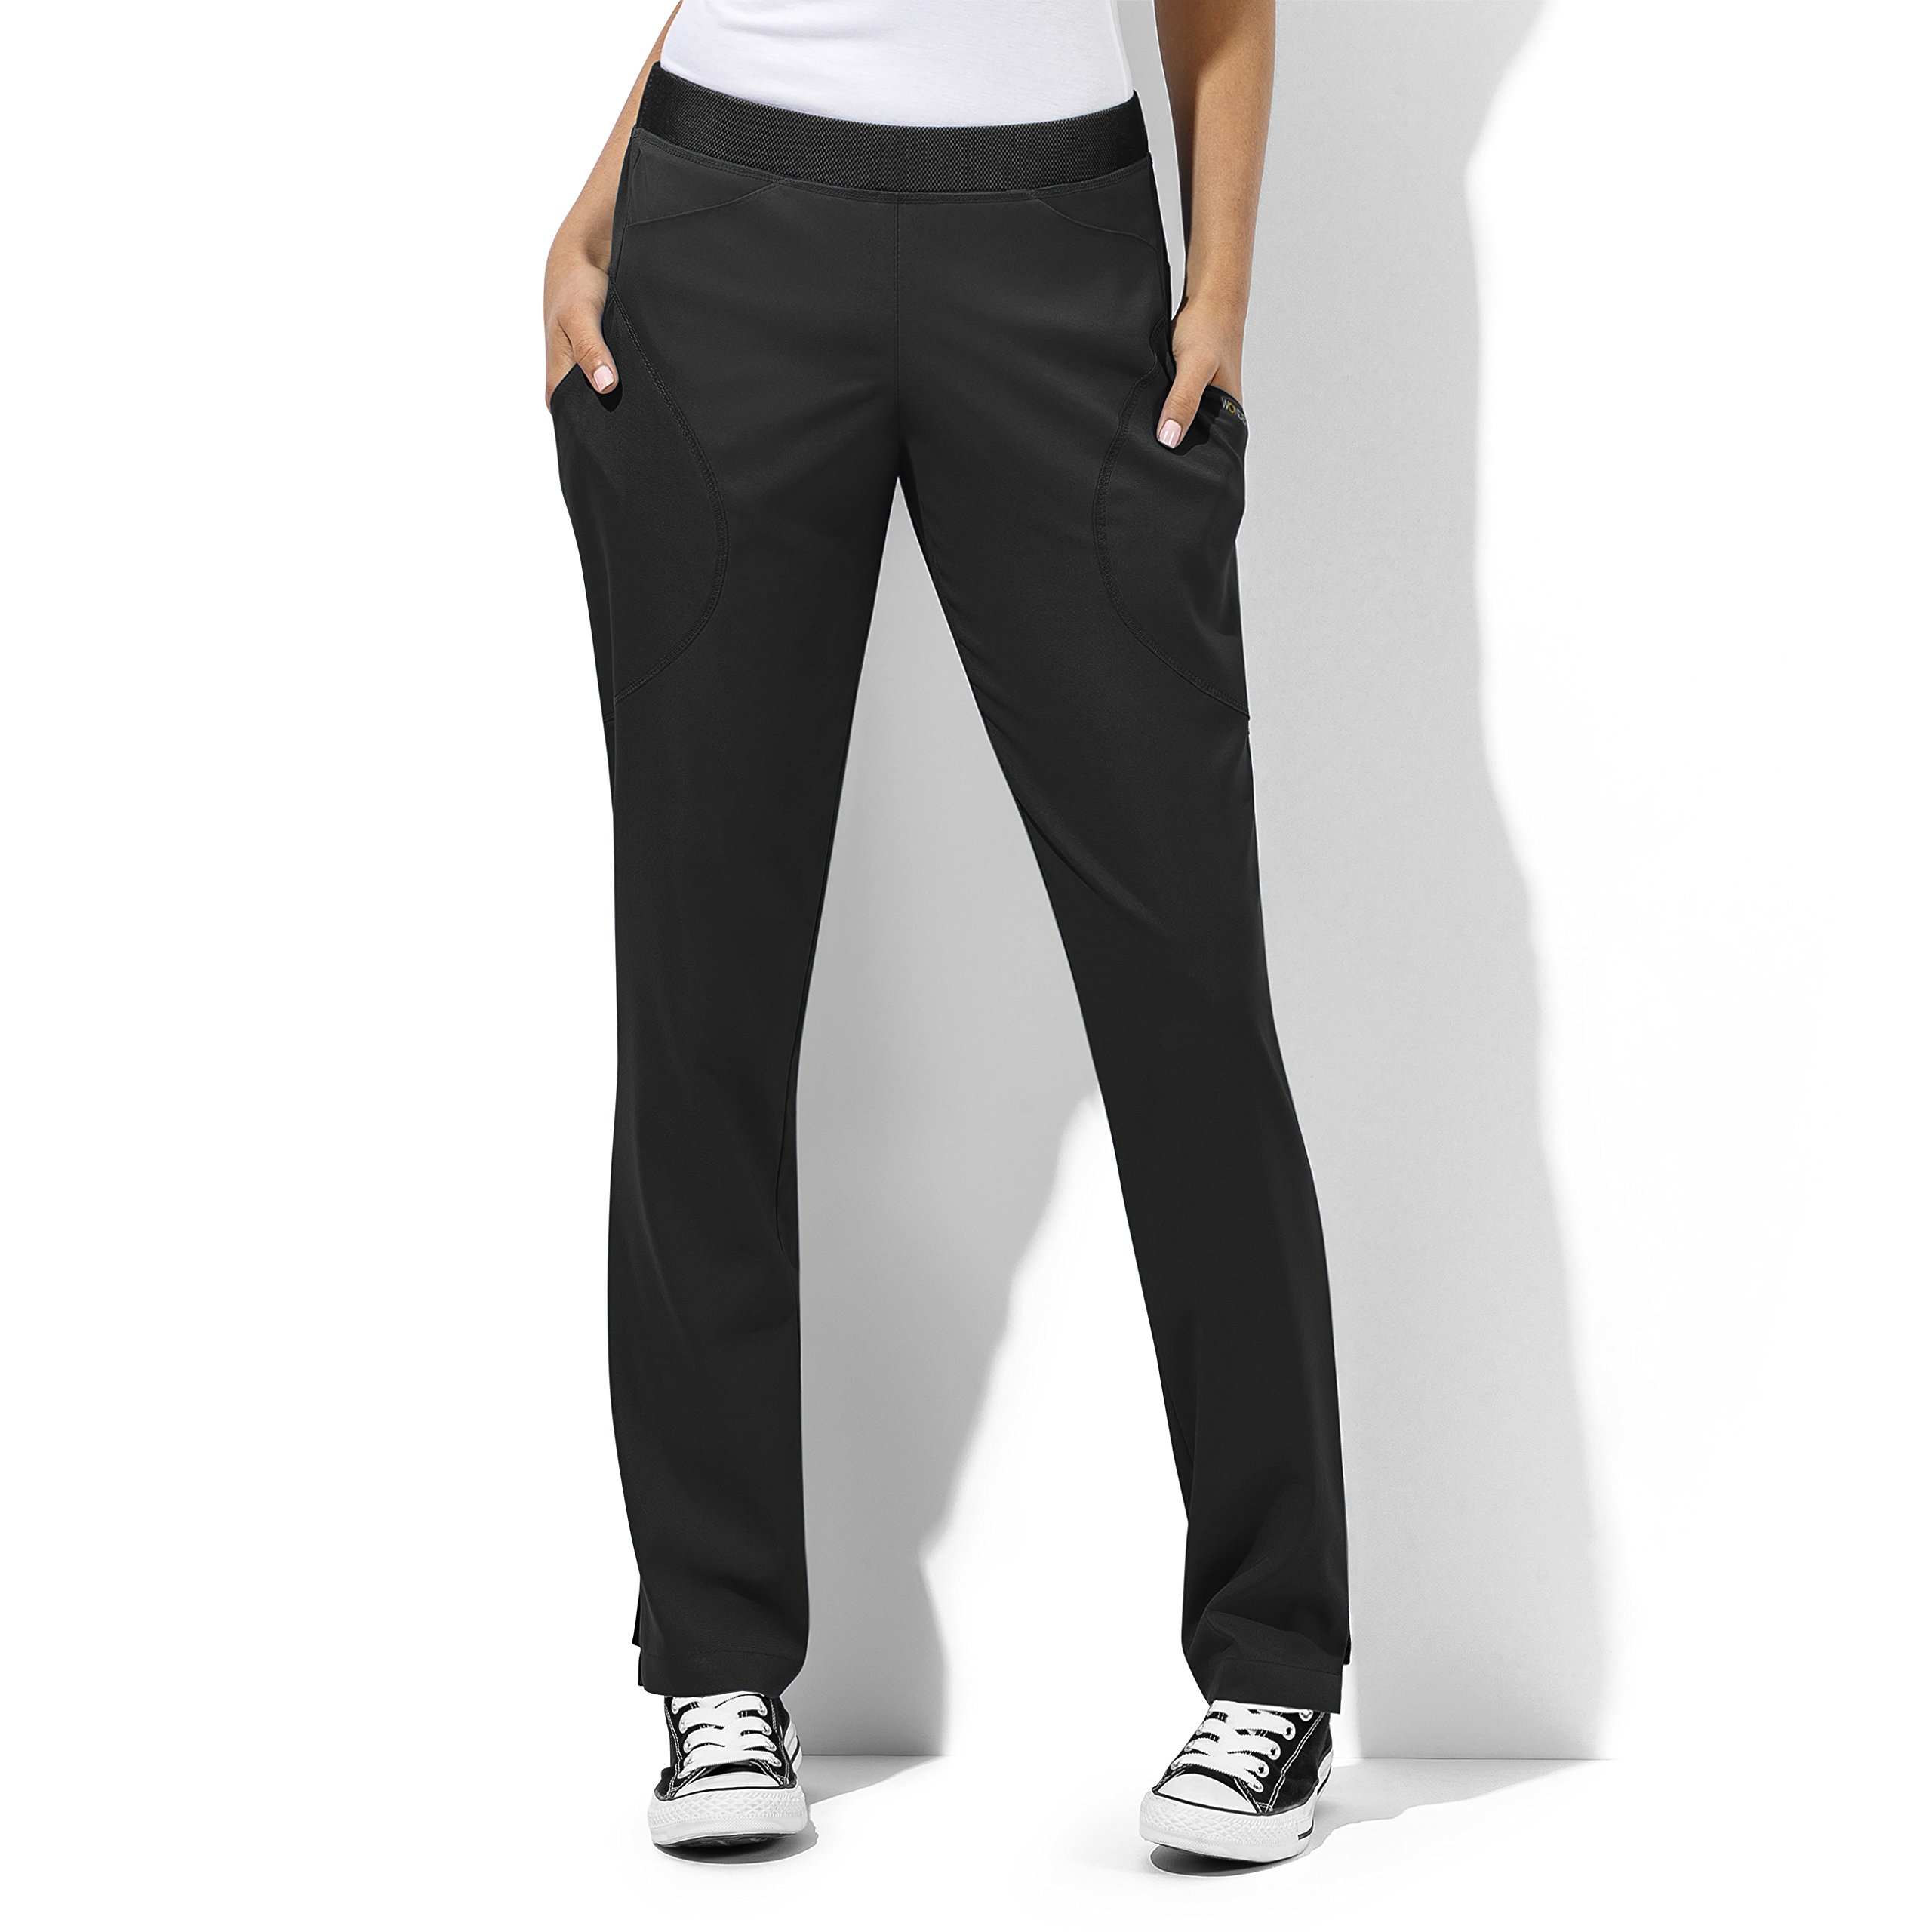 WonderTech Women's 5113 6 Pocket Straight Leg Pant- Black- Medium